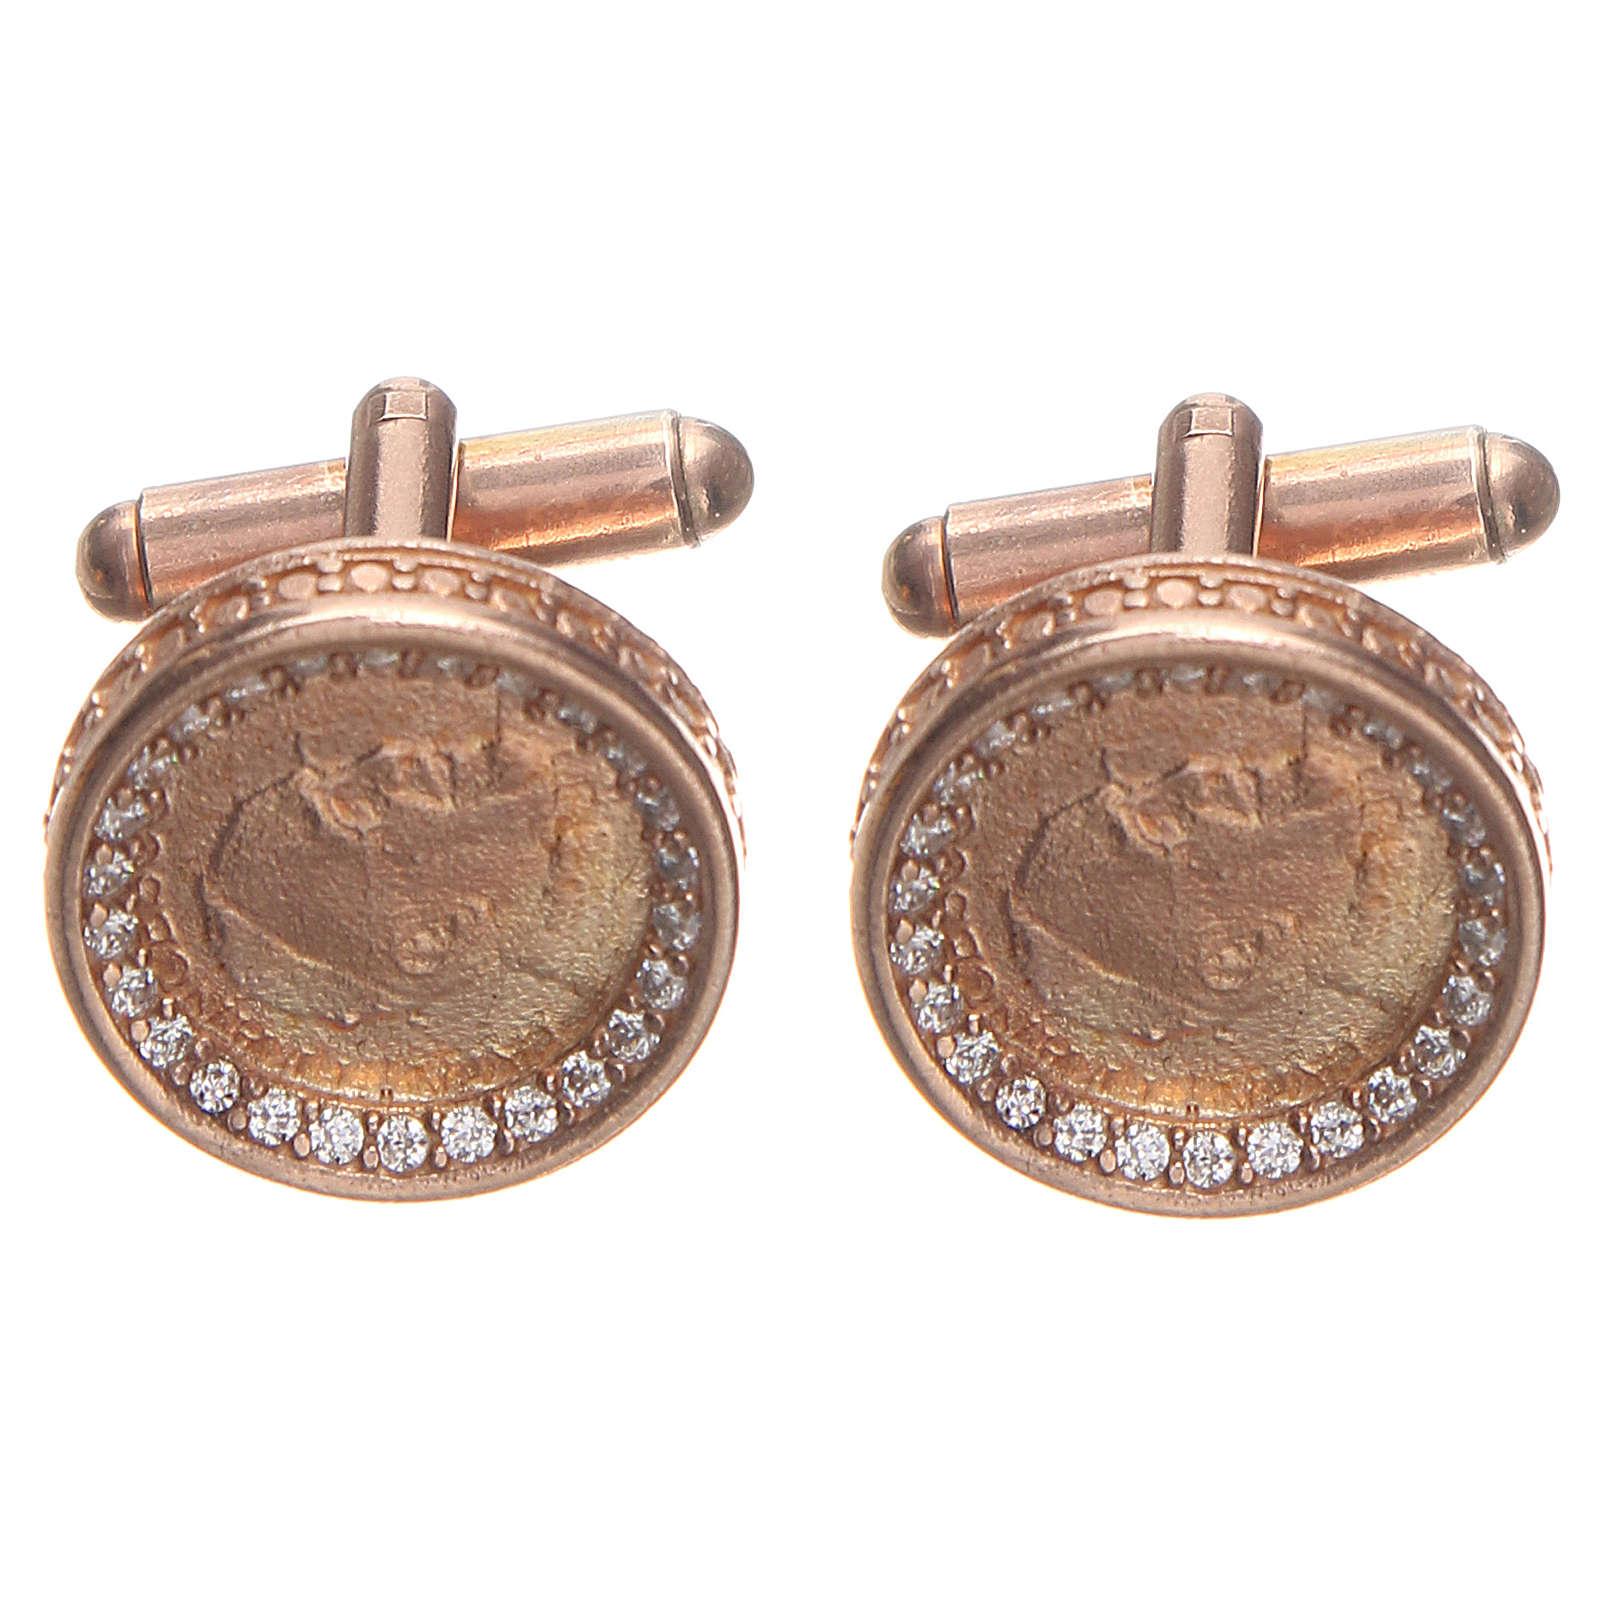 Mancuernillas de pulsera plata 800 Papa Francisco 1,7 cm rosada 4